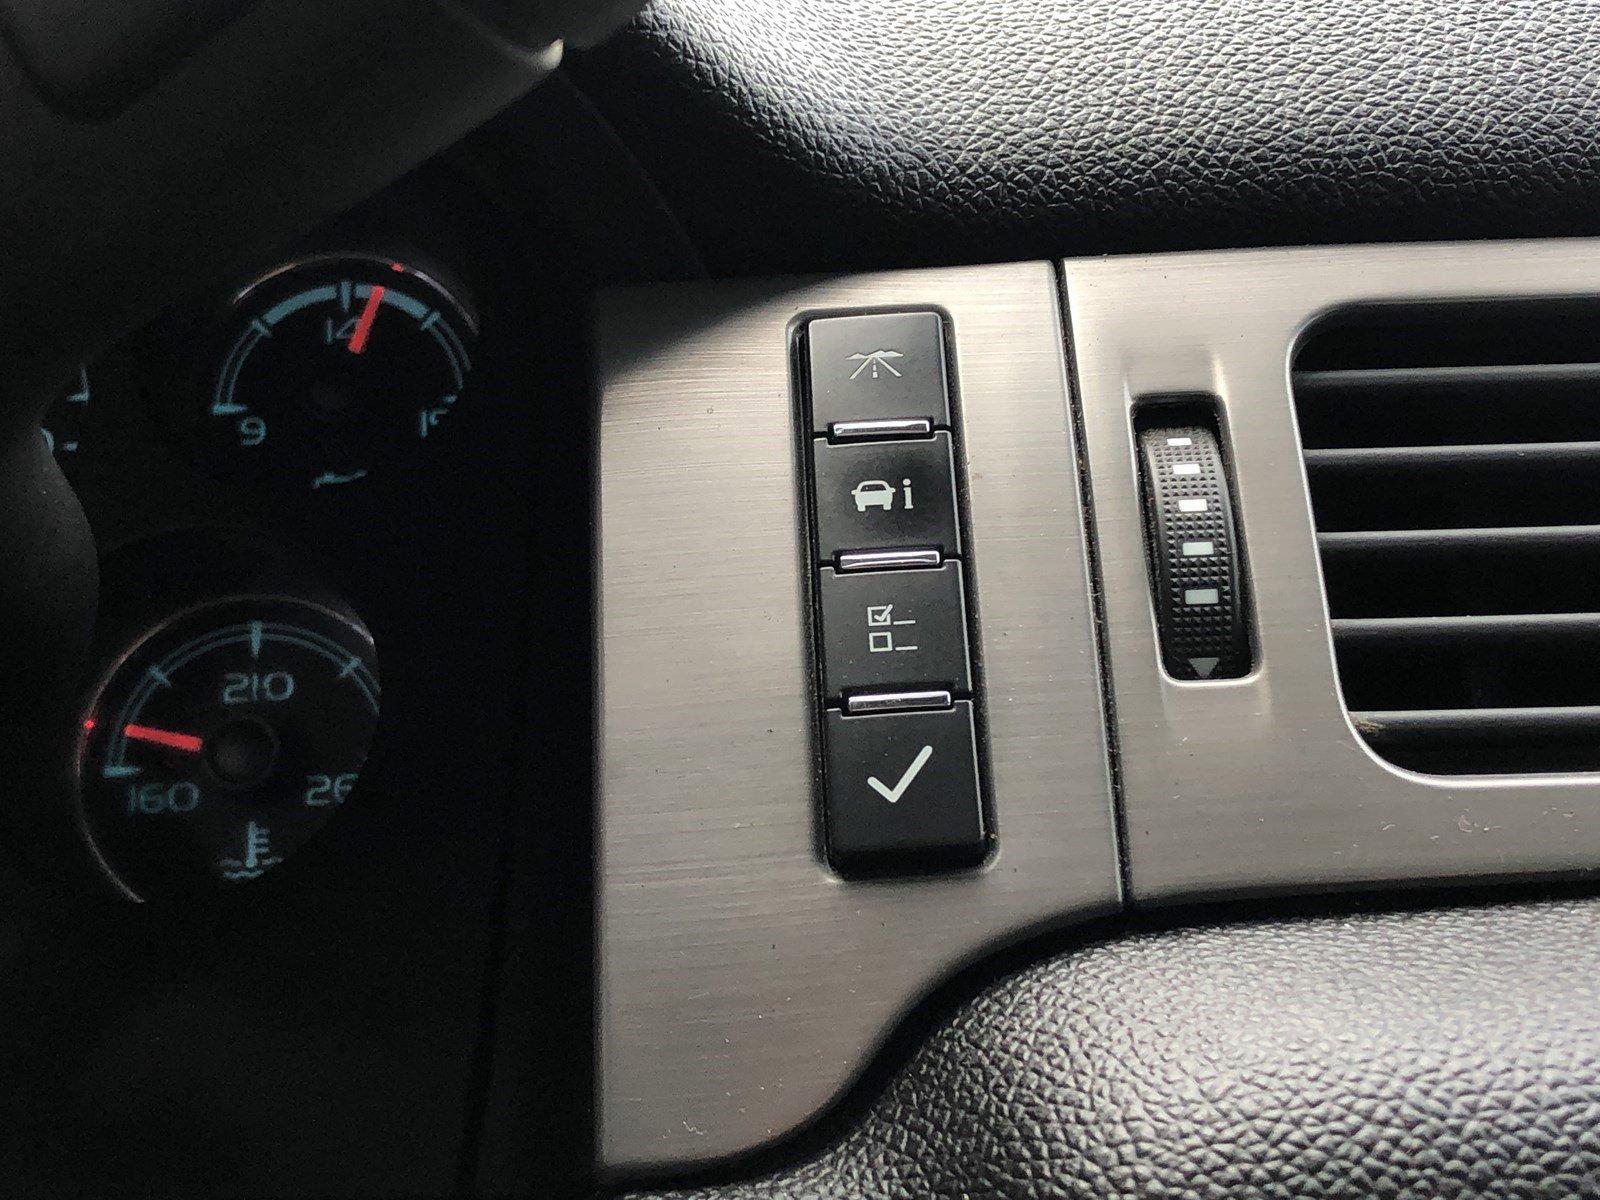 Pre-Owned 2012 Chevrolet Silverado 2500HD LTZ